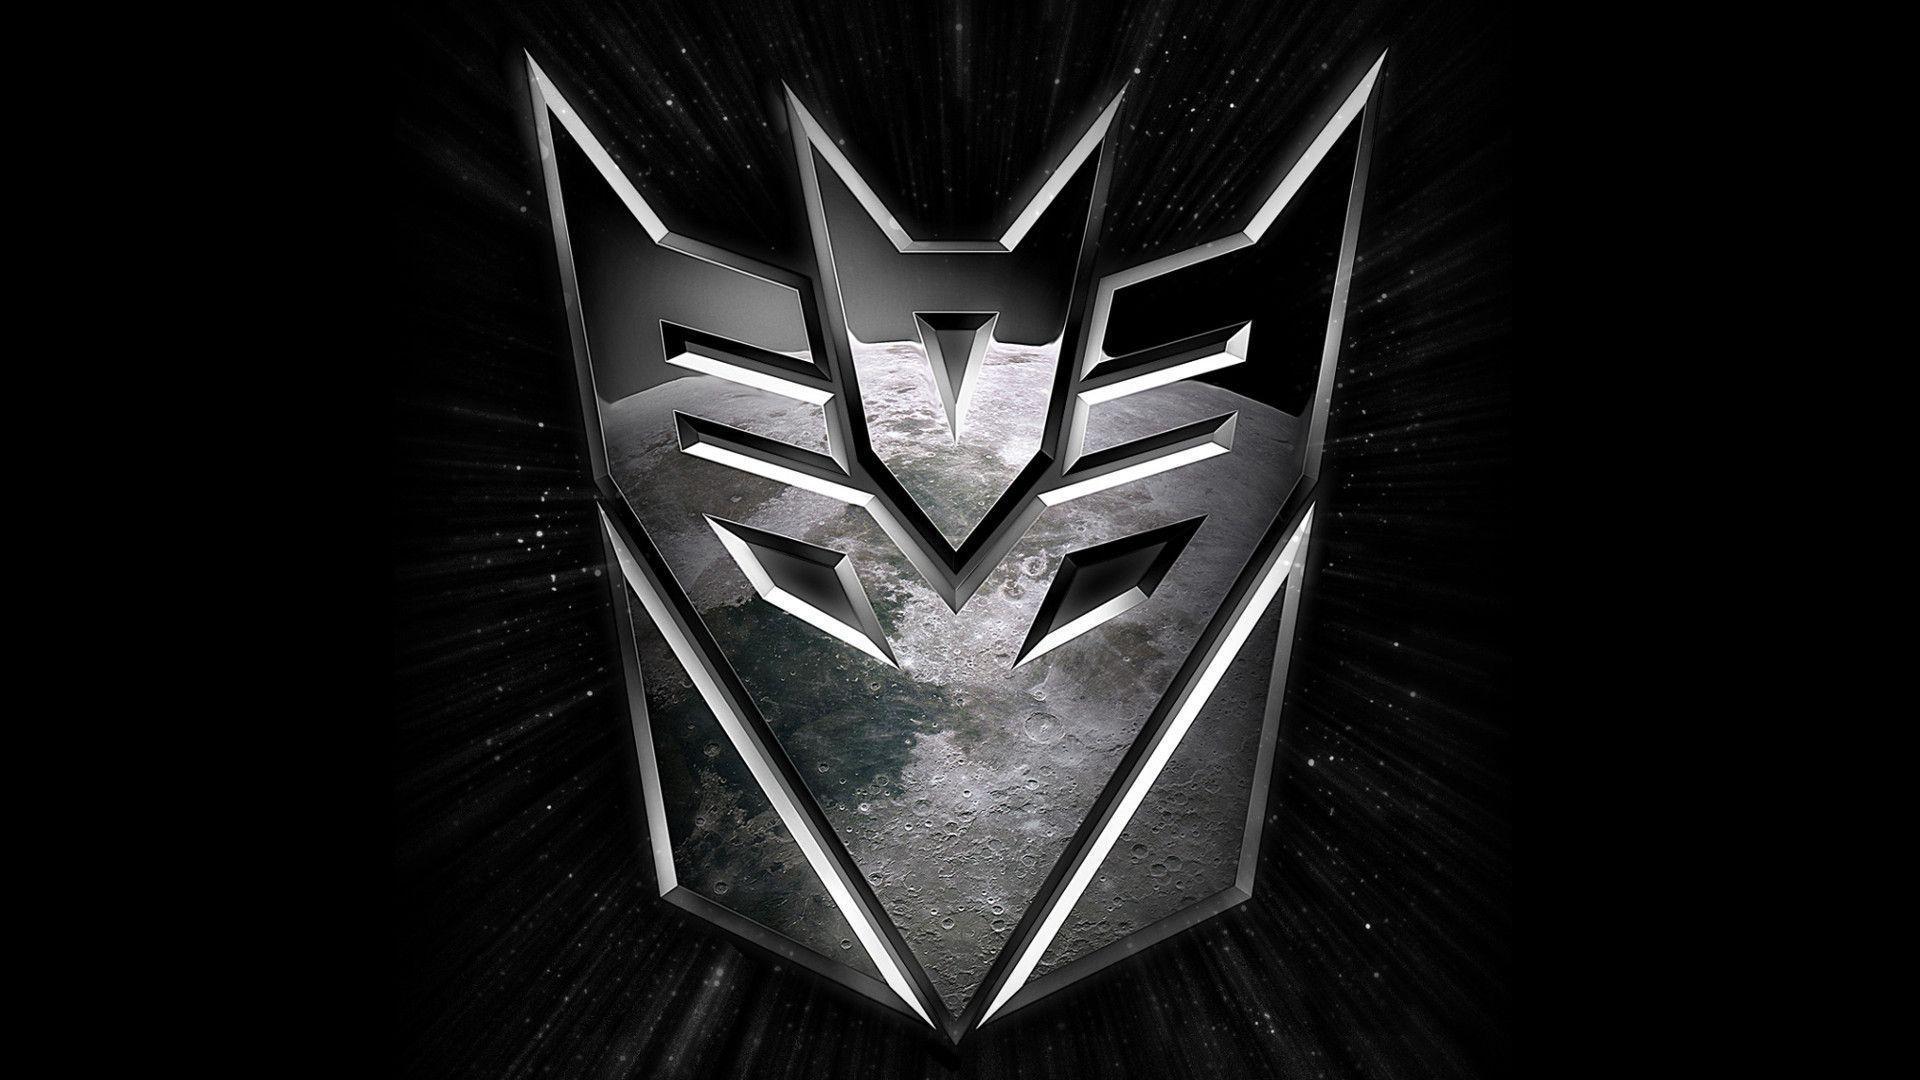 Transformers Decepticons Logo Wallpaper